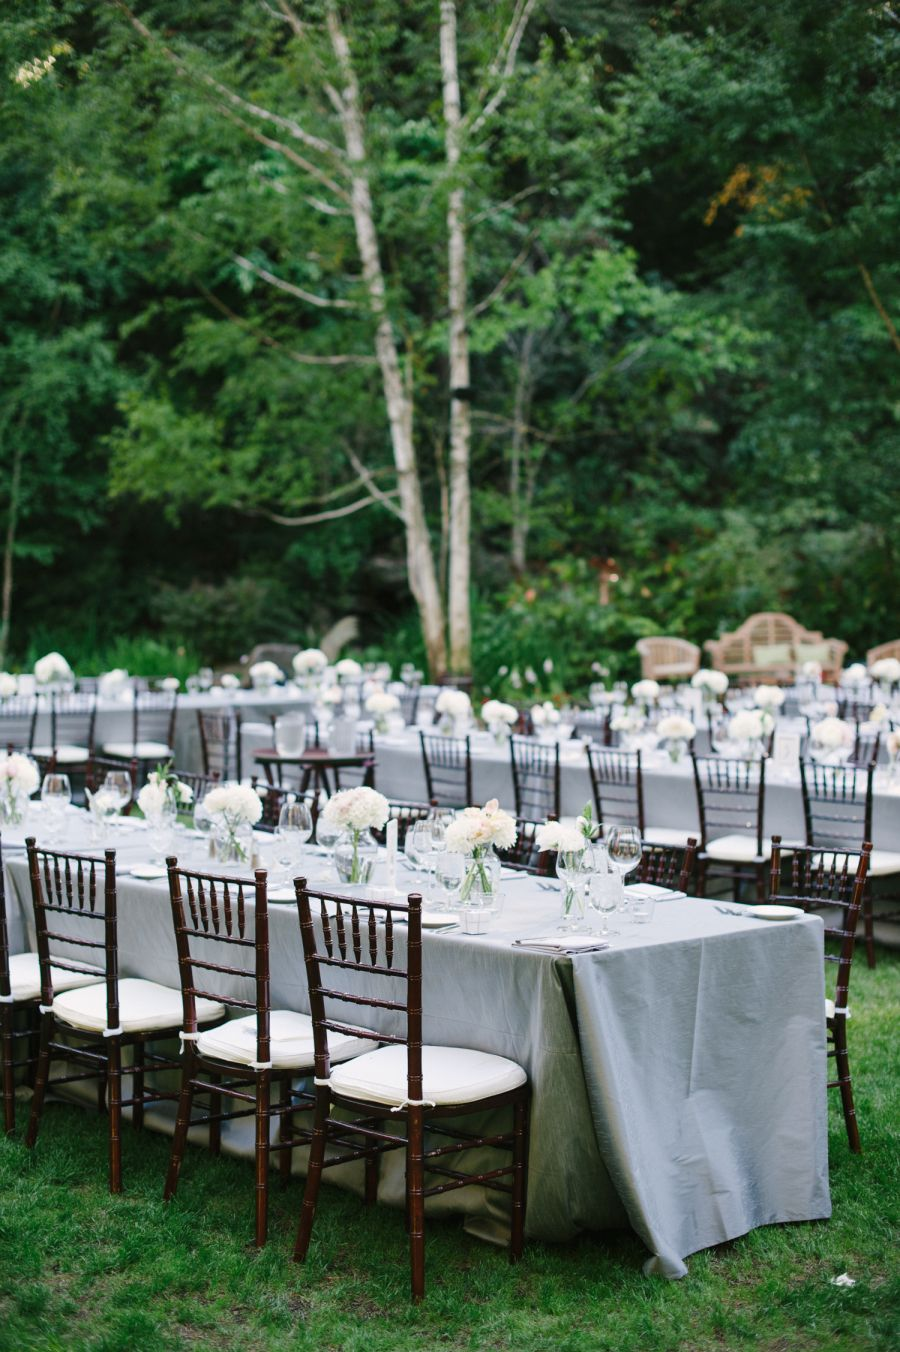 Classic Wedding among the trees at Nestldown Wedding